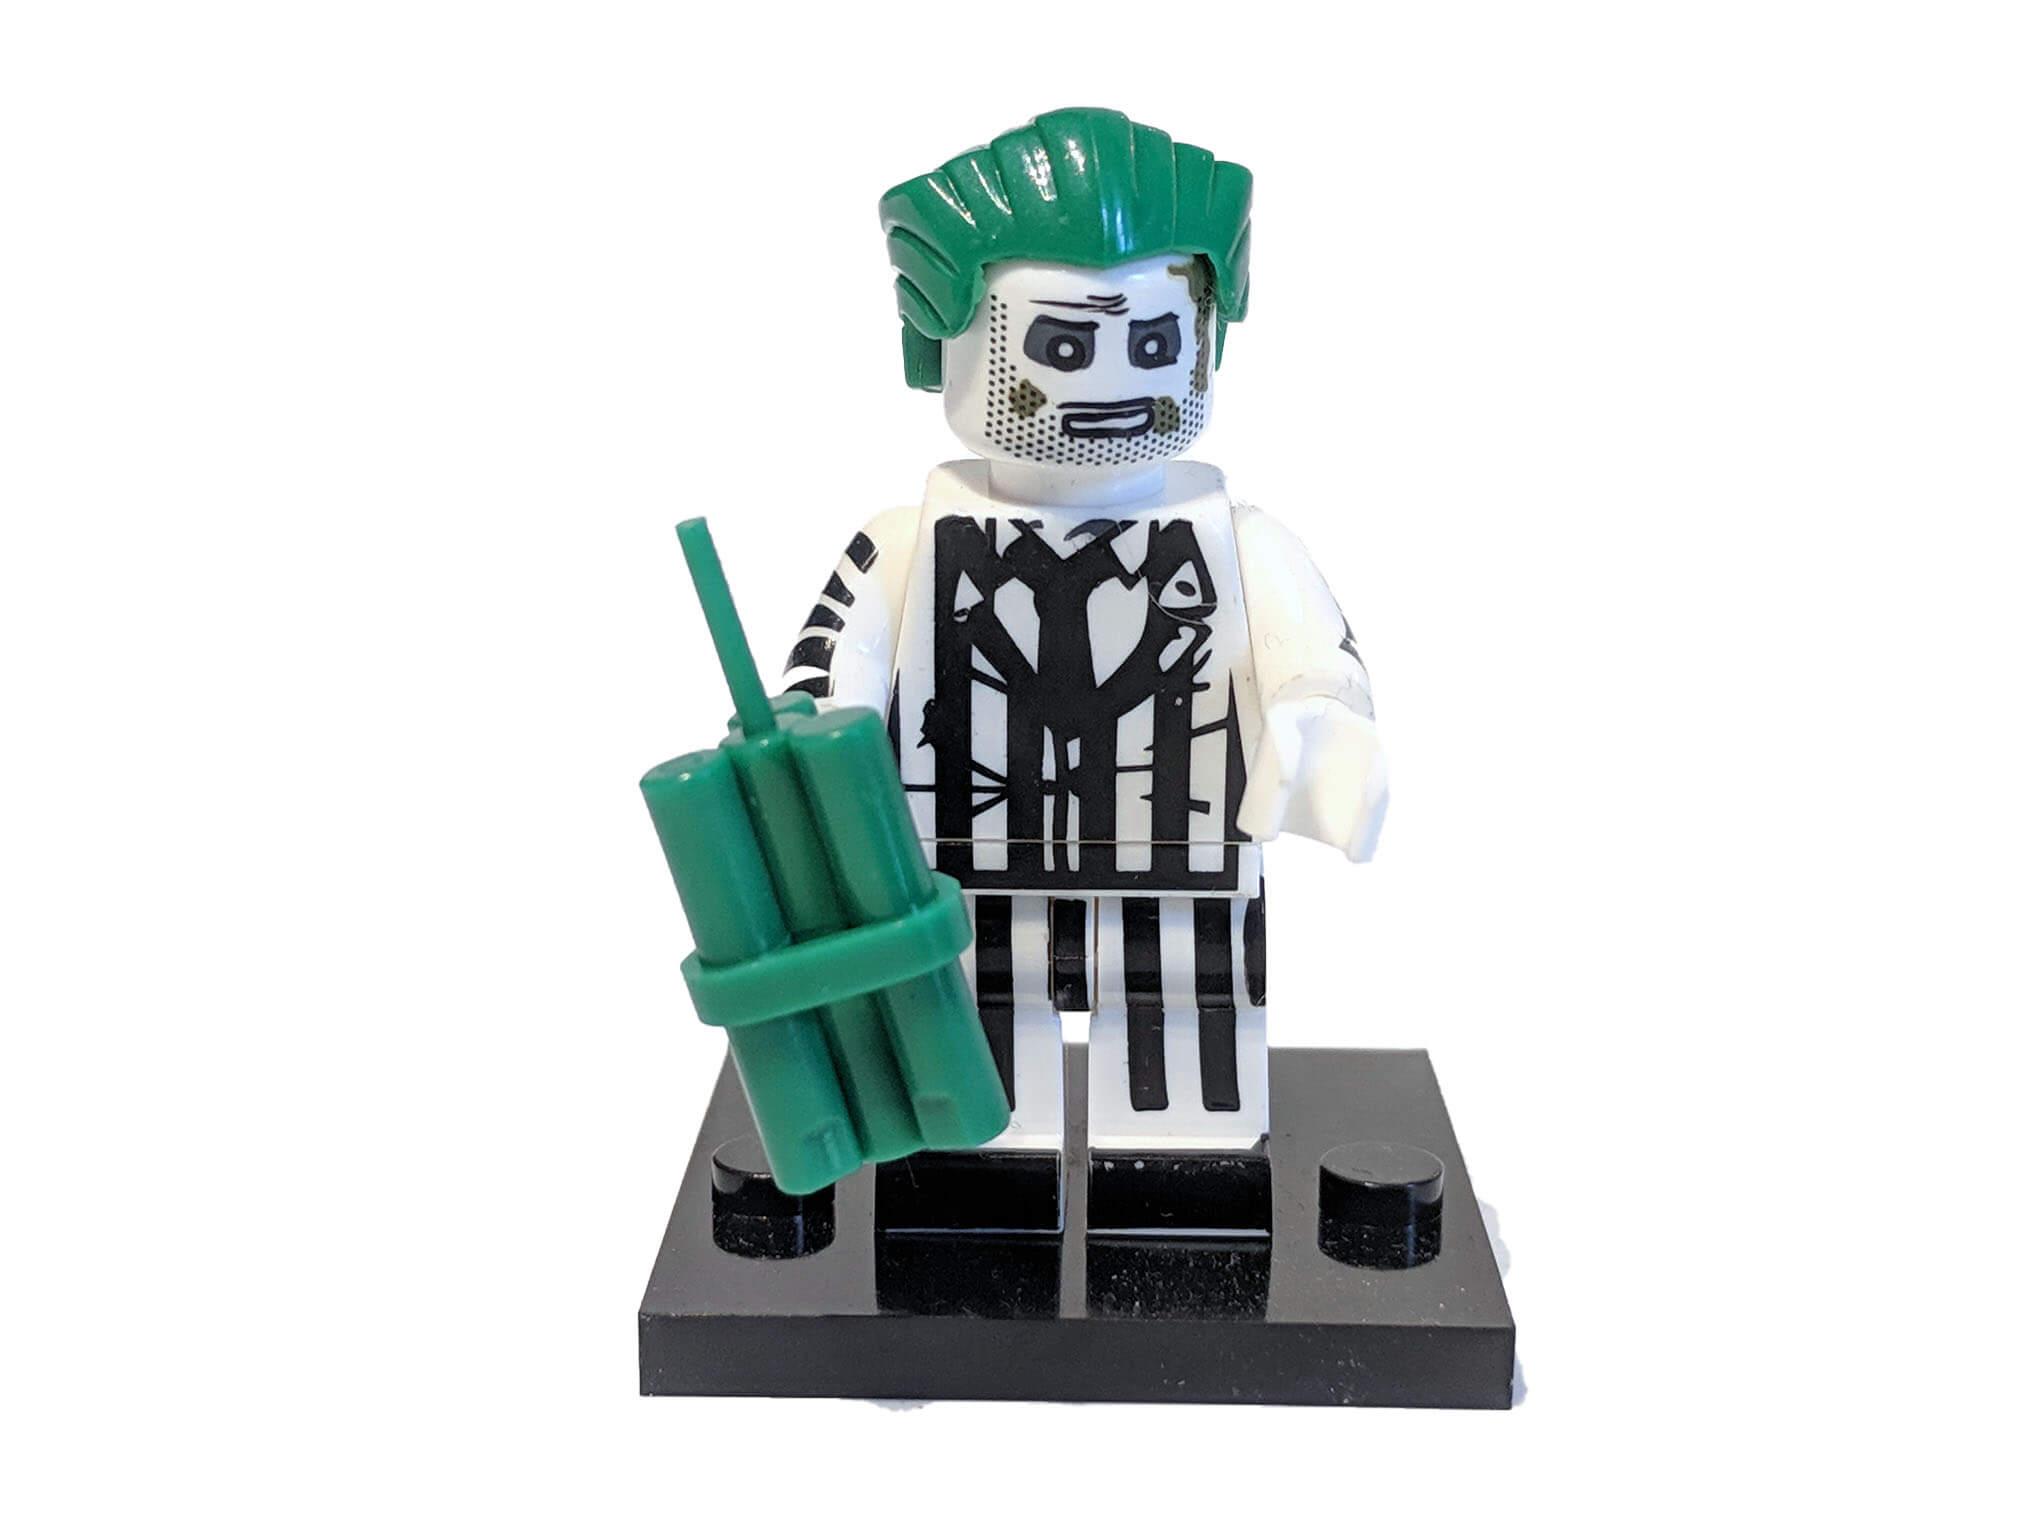 LEGO-Beetlejuice.jpg